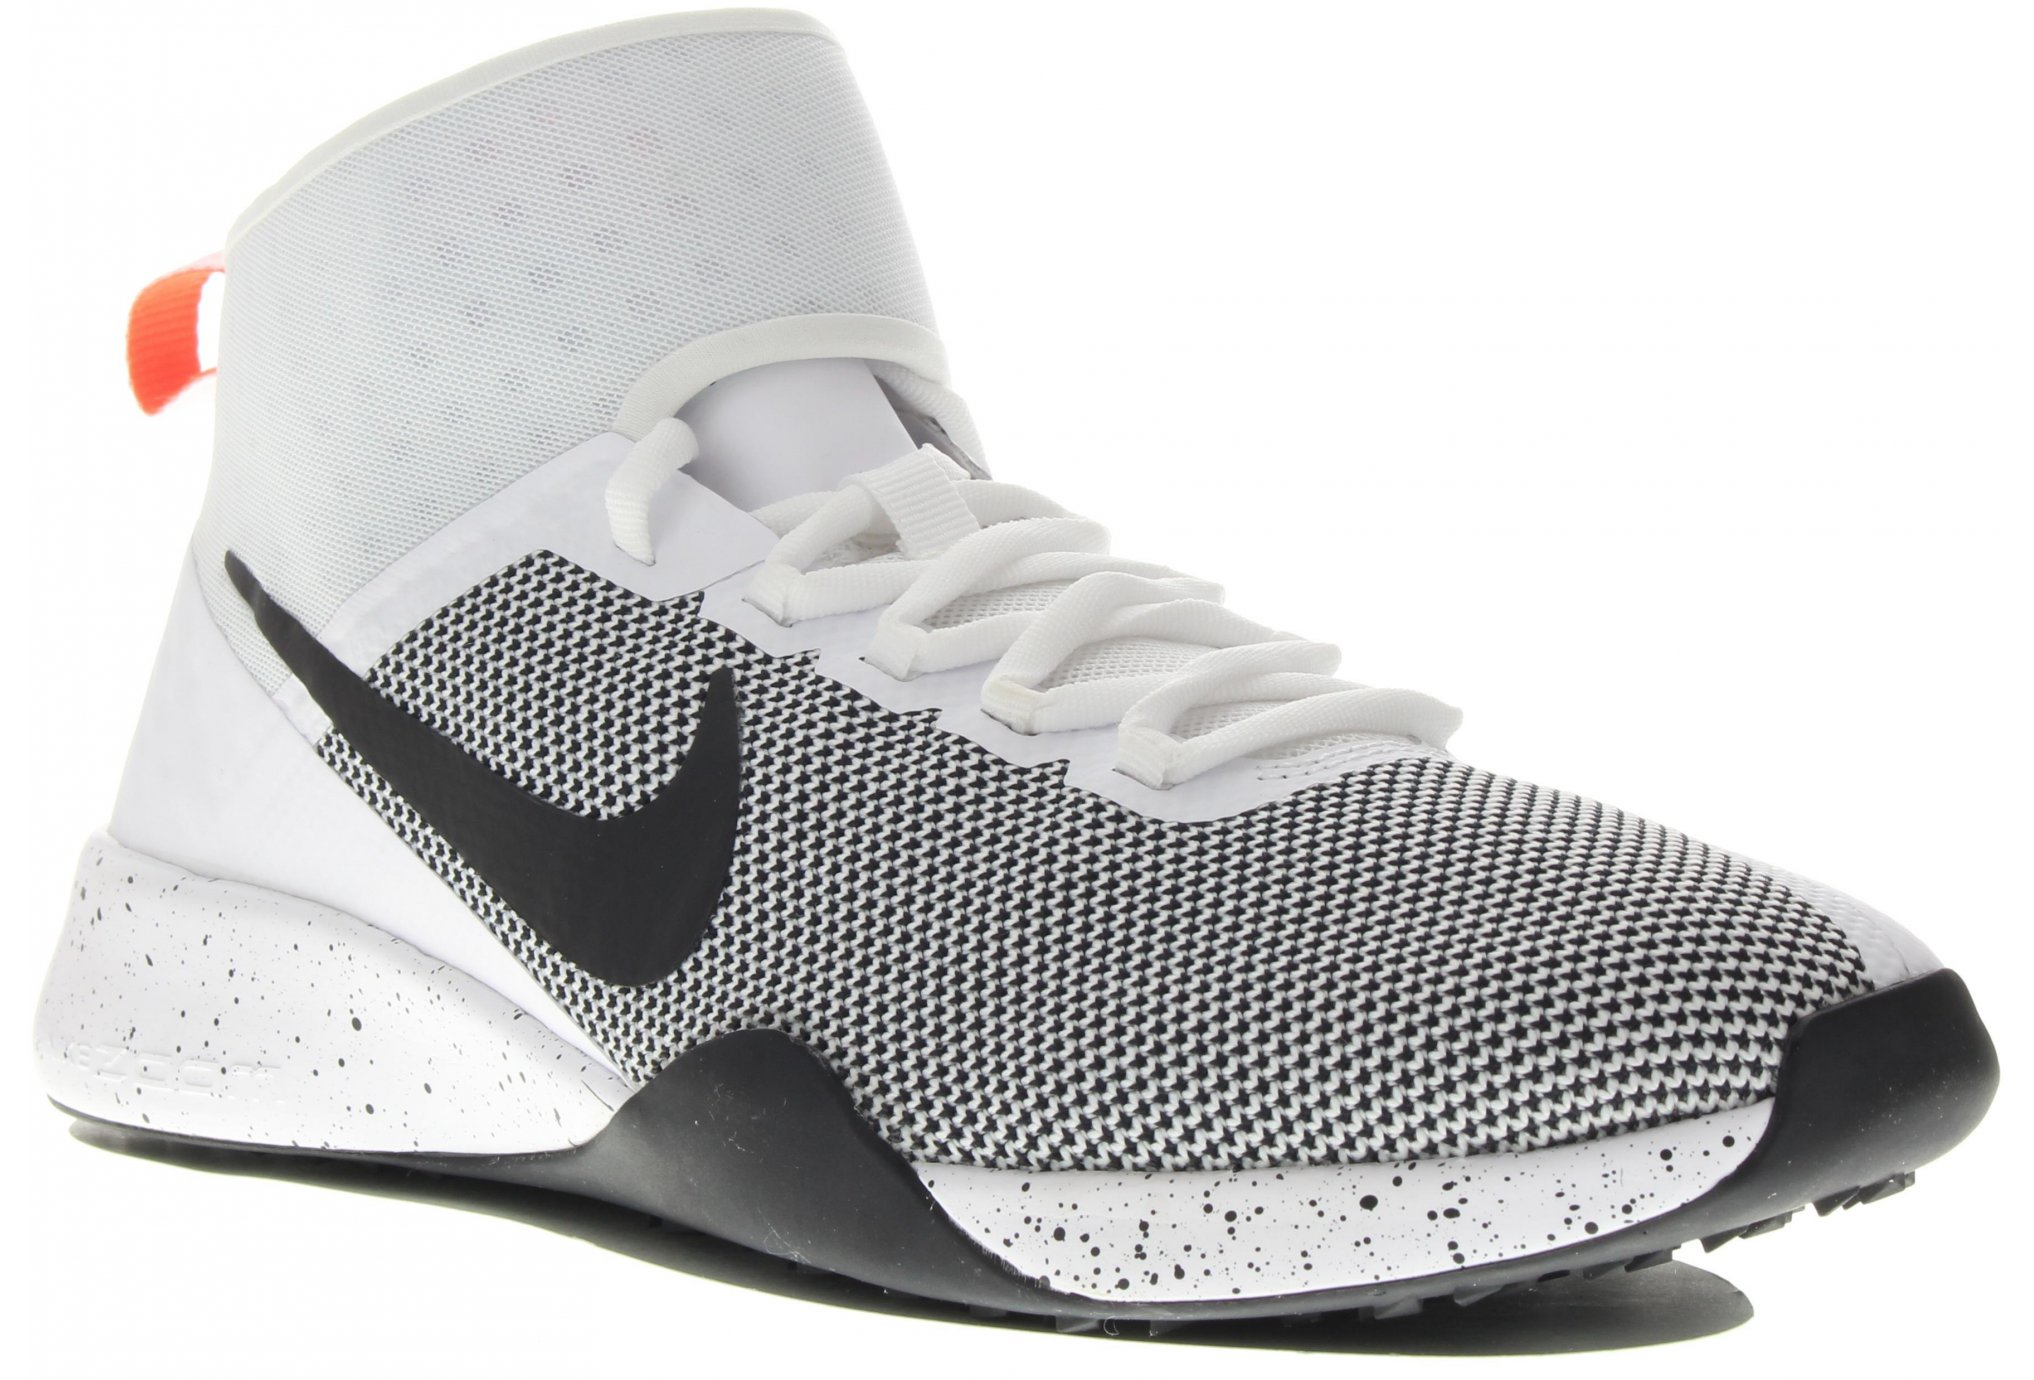 Nike Air Zoom Strong 2 W Diététique Chaussures femme